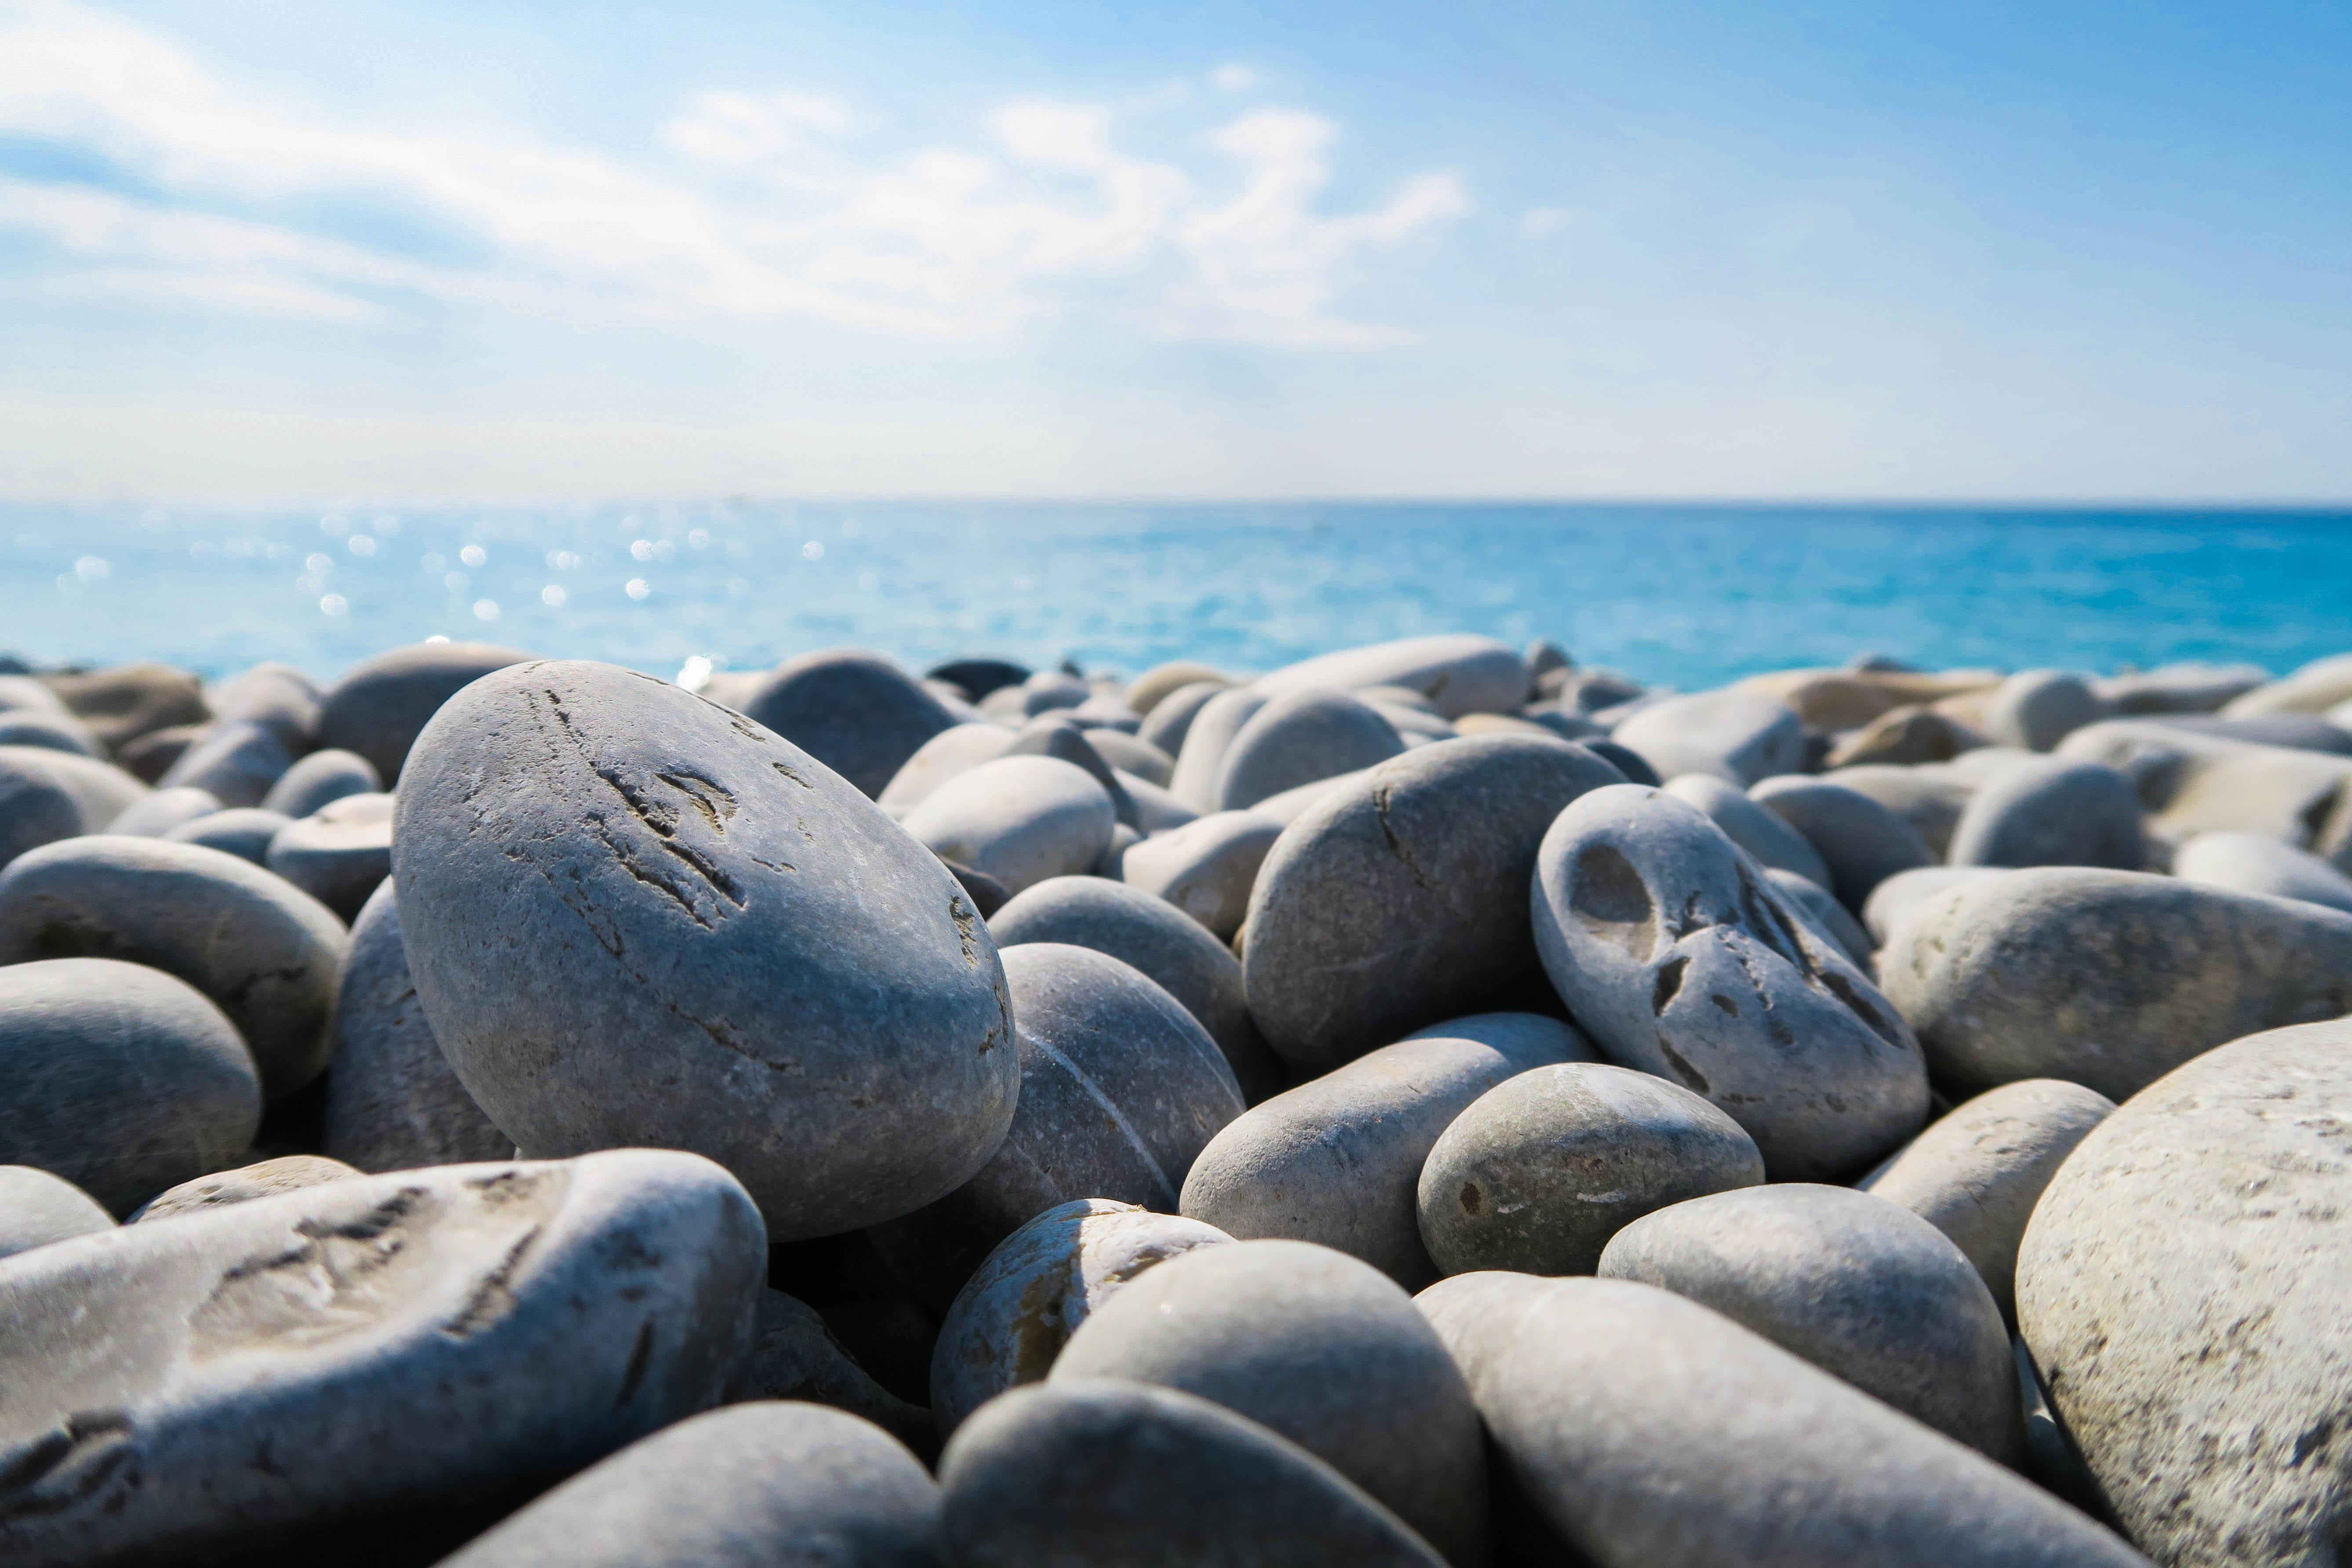 Free Images Beach Sea Coast Sand Rock Ocean Shore Pebble Blue Material Stones Pebbles Breakwater Wind Wave 5350x3567 1114334 Free Stock Photos Pxhere Rocks stones horizon coast sand sea